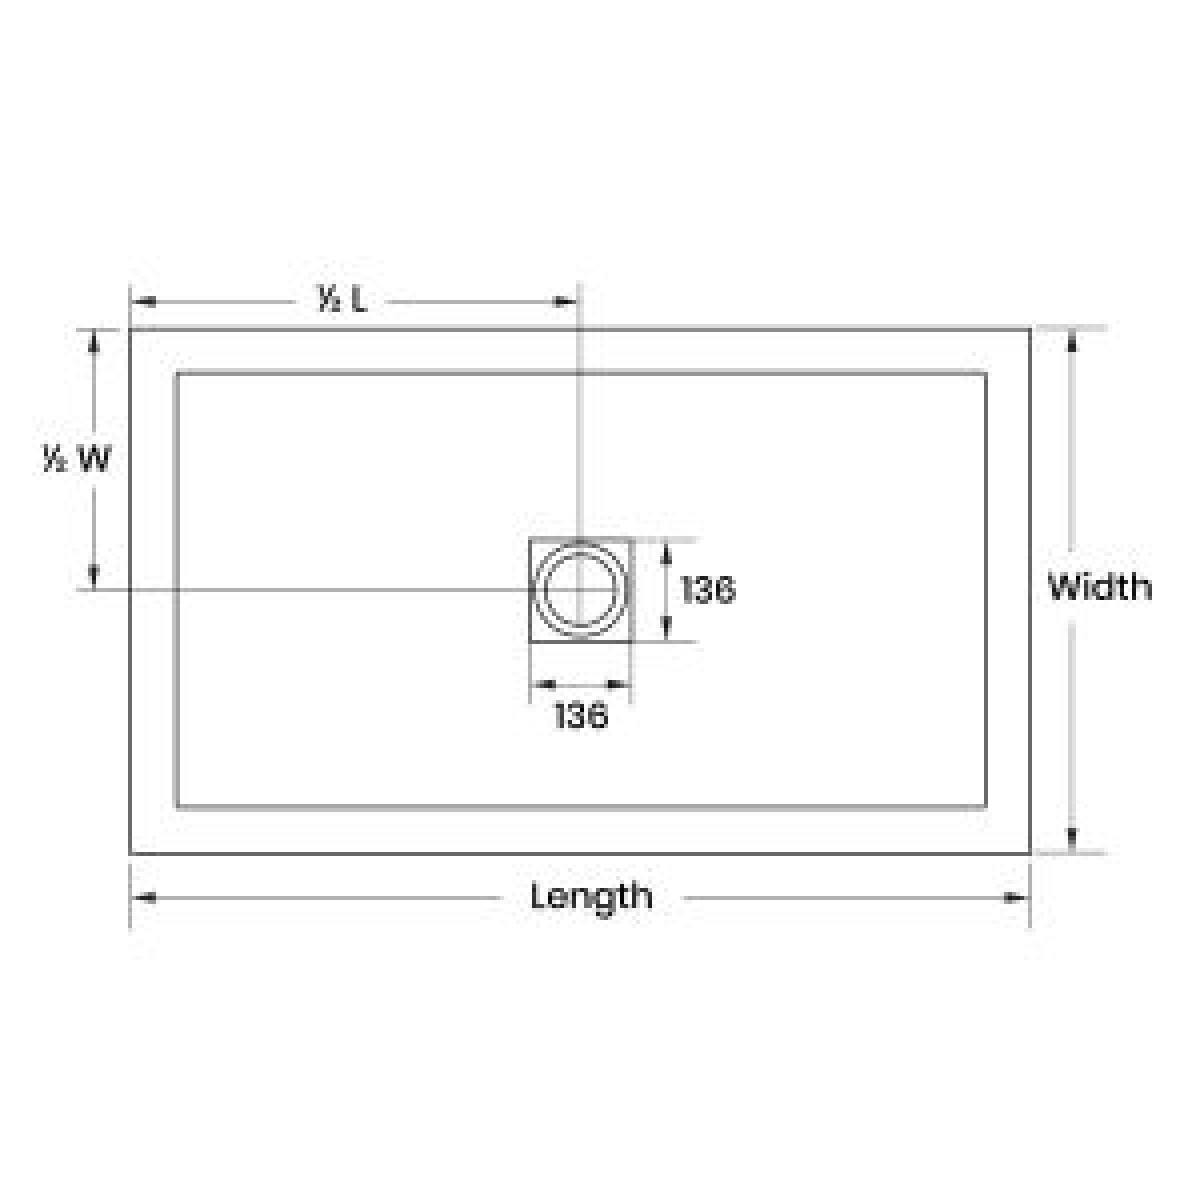 Aquadart Black Slate Shower Tray 1200 x 800 Dimension